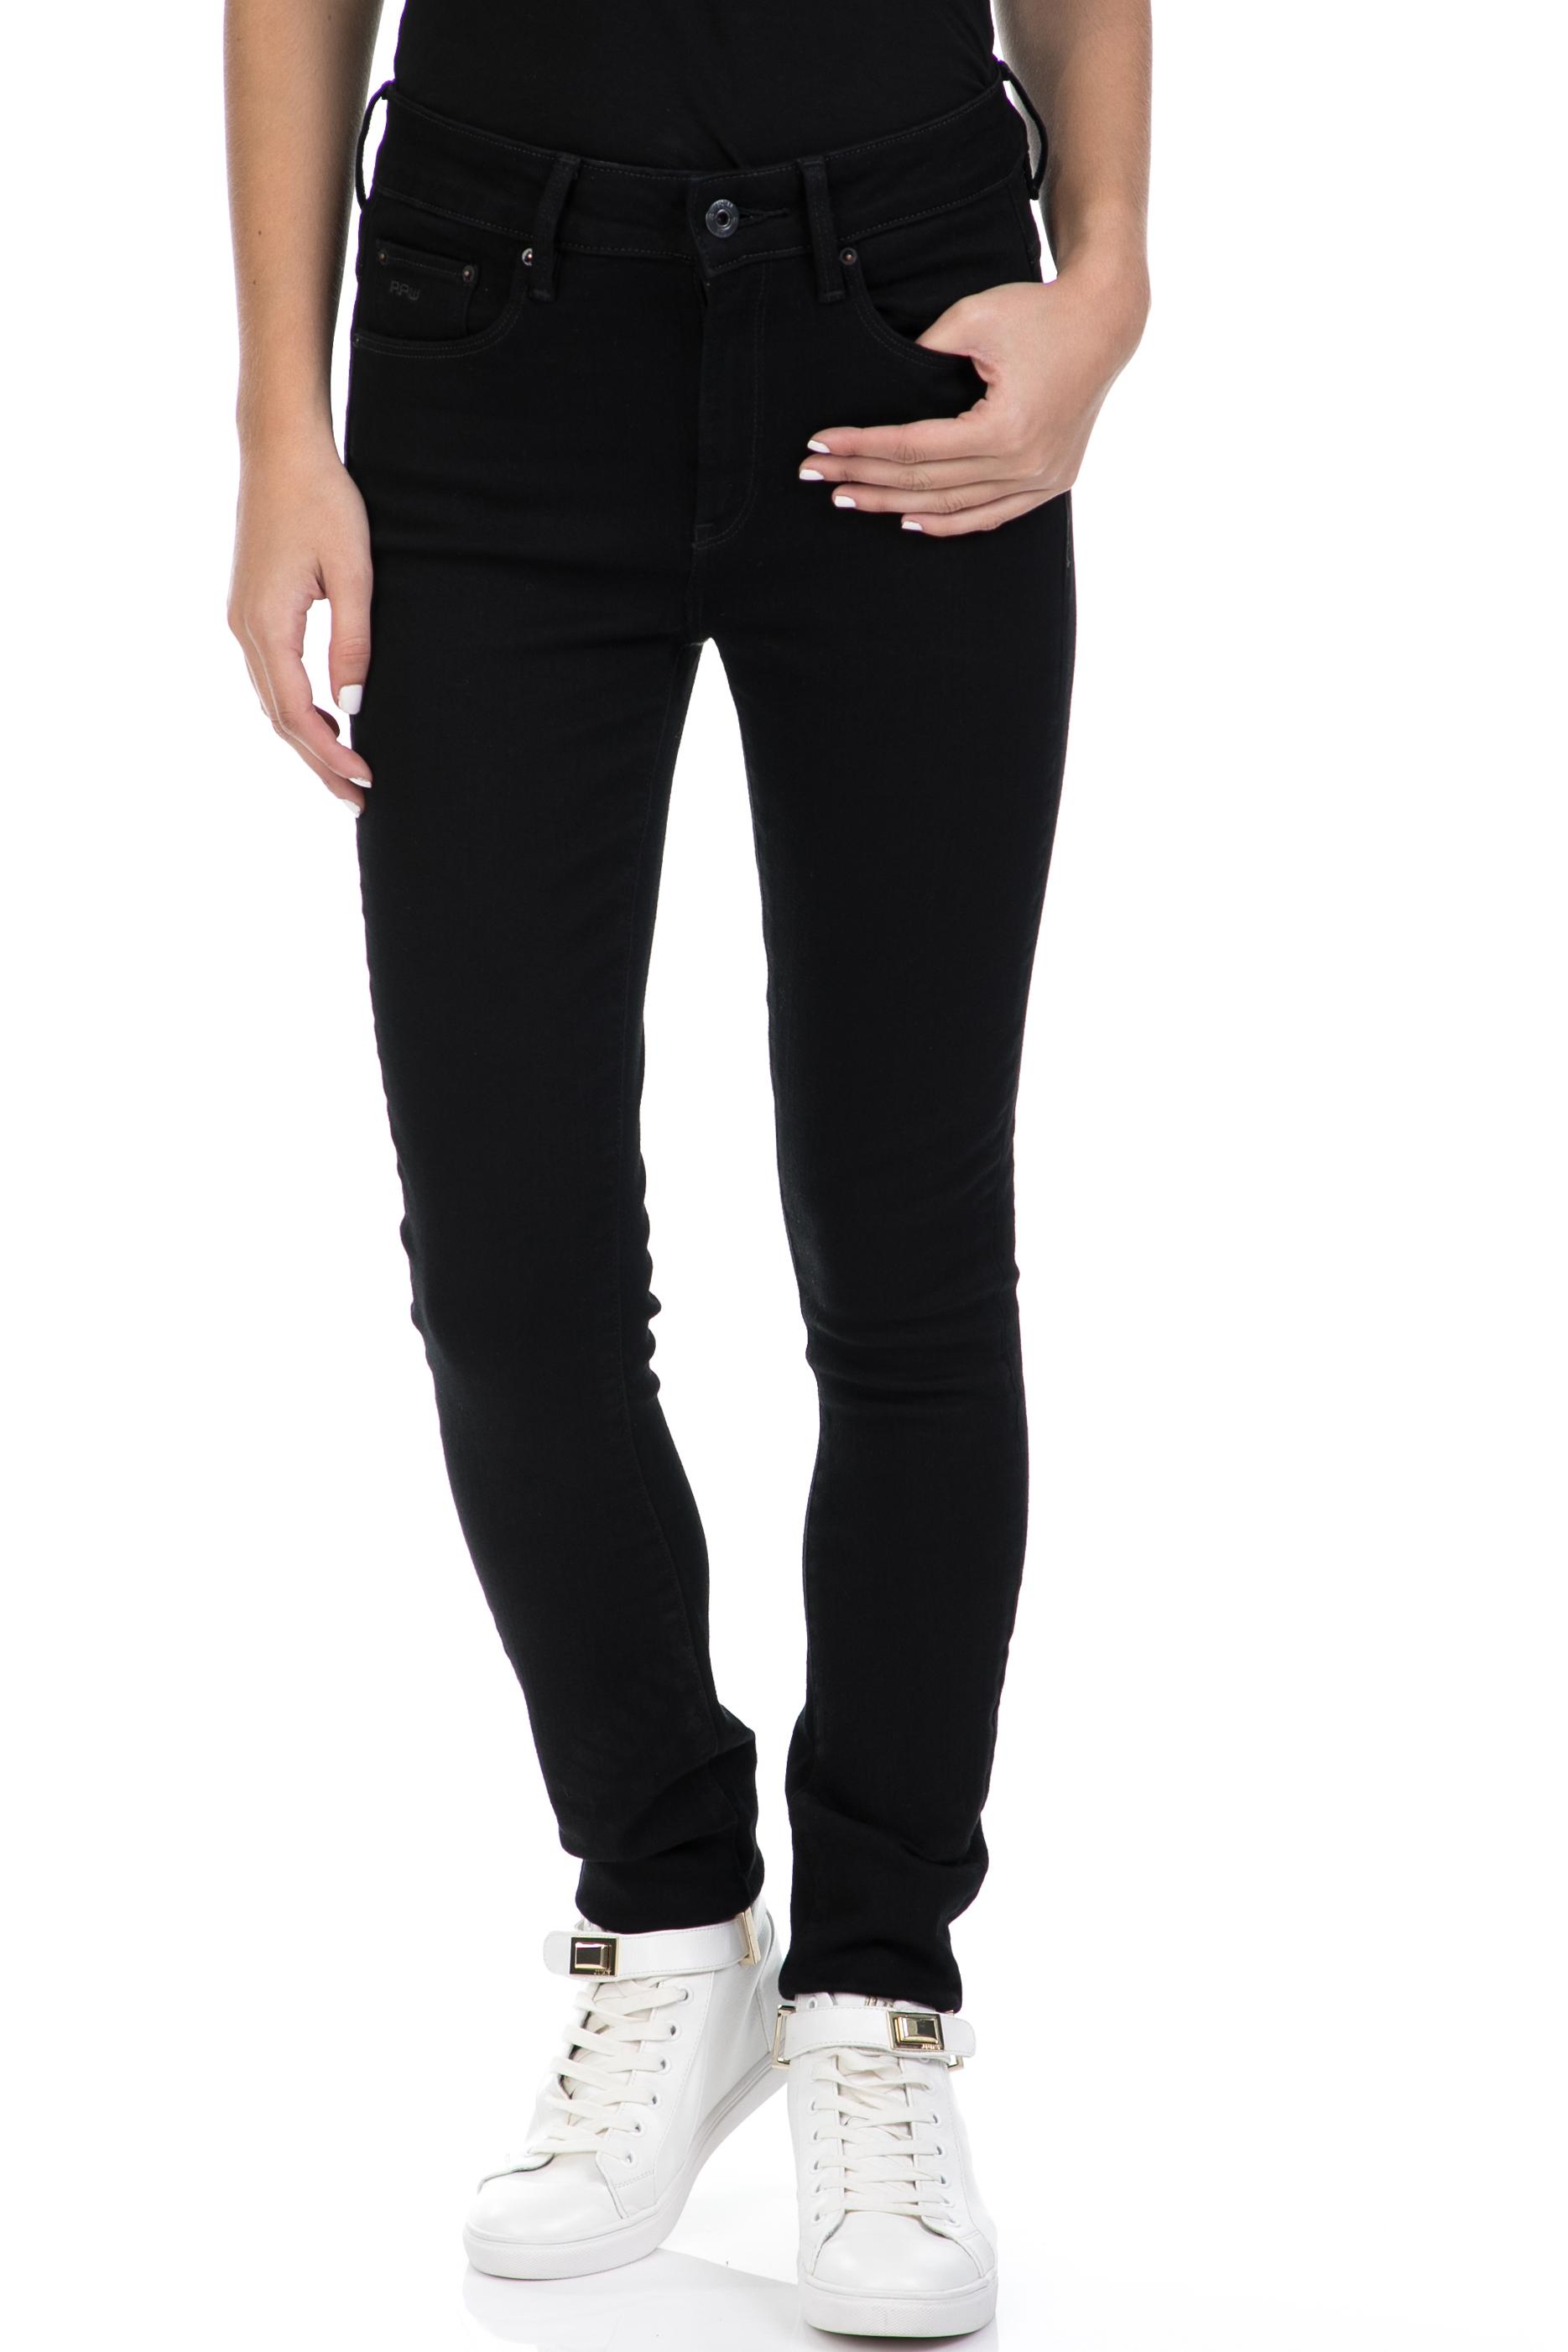 67075ac2717e Factoryoutlet G-STAR - Γυναικείο τζιν παντελόνι 3301 High Skinny μαύρο